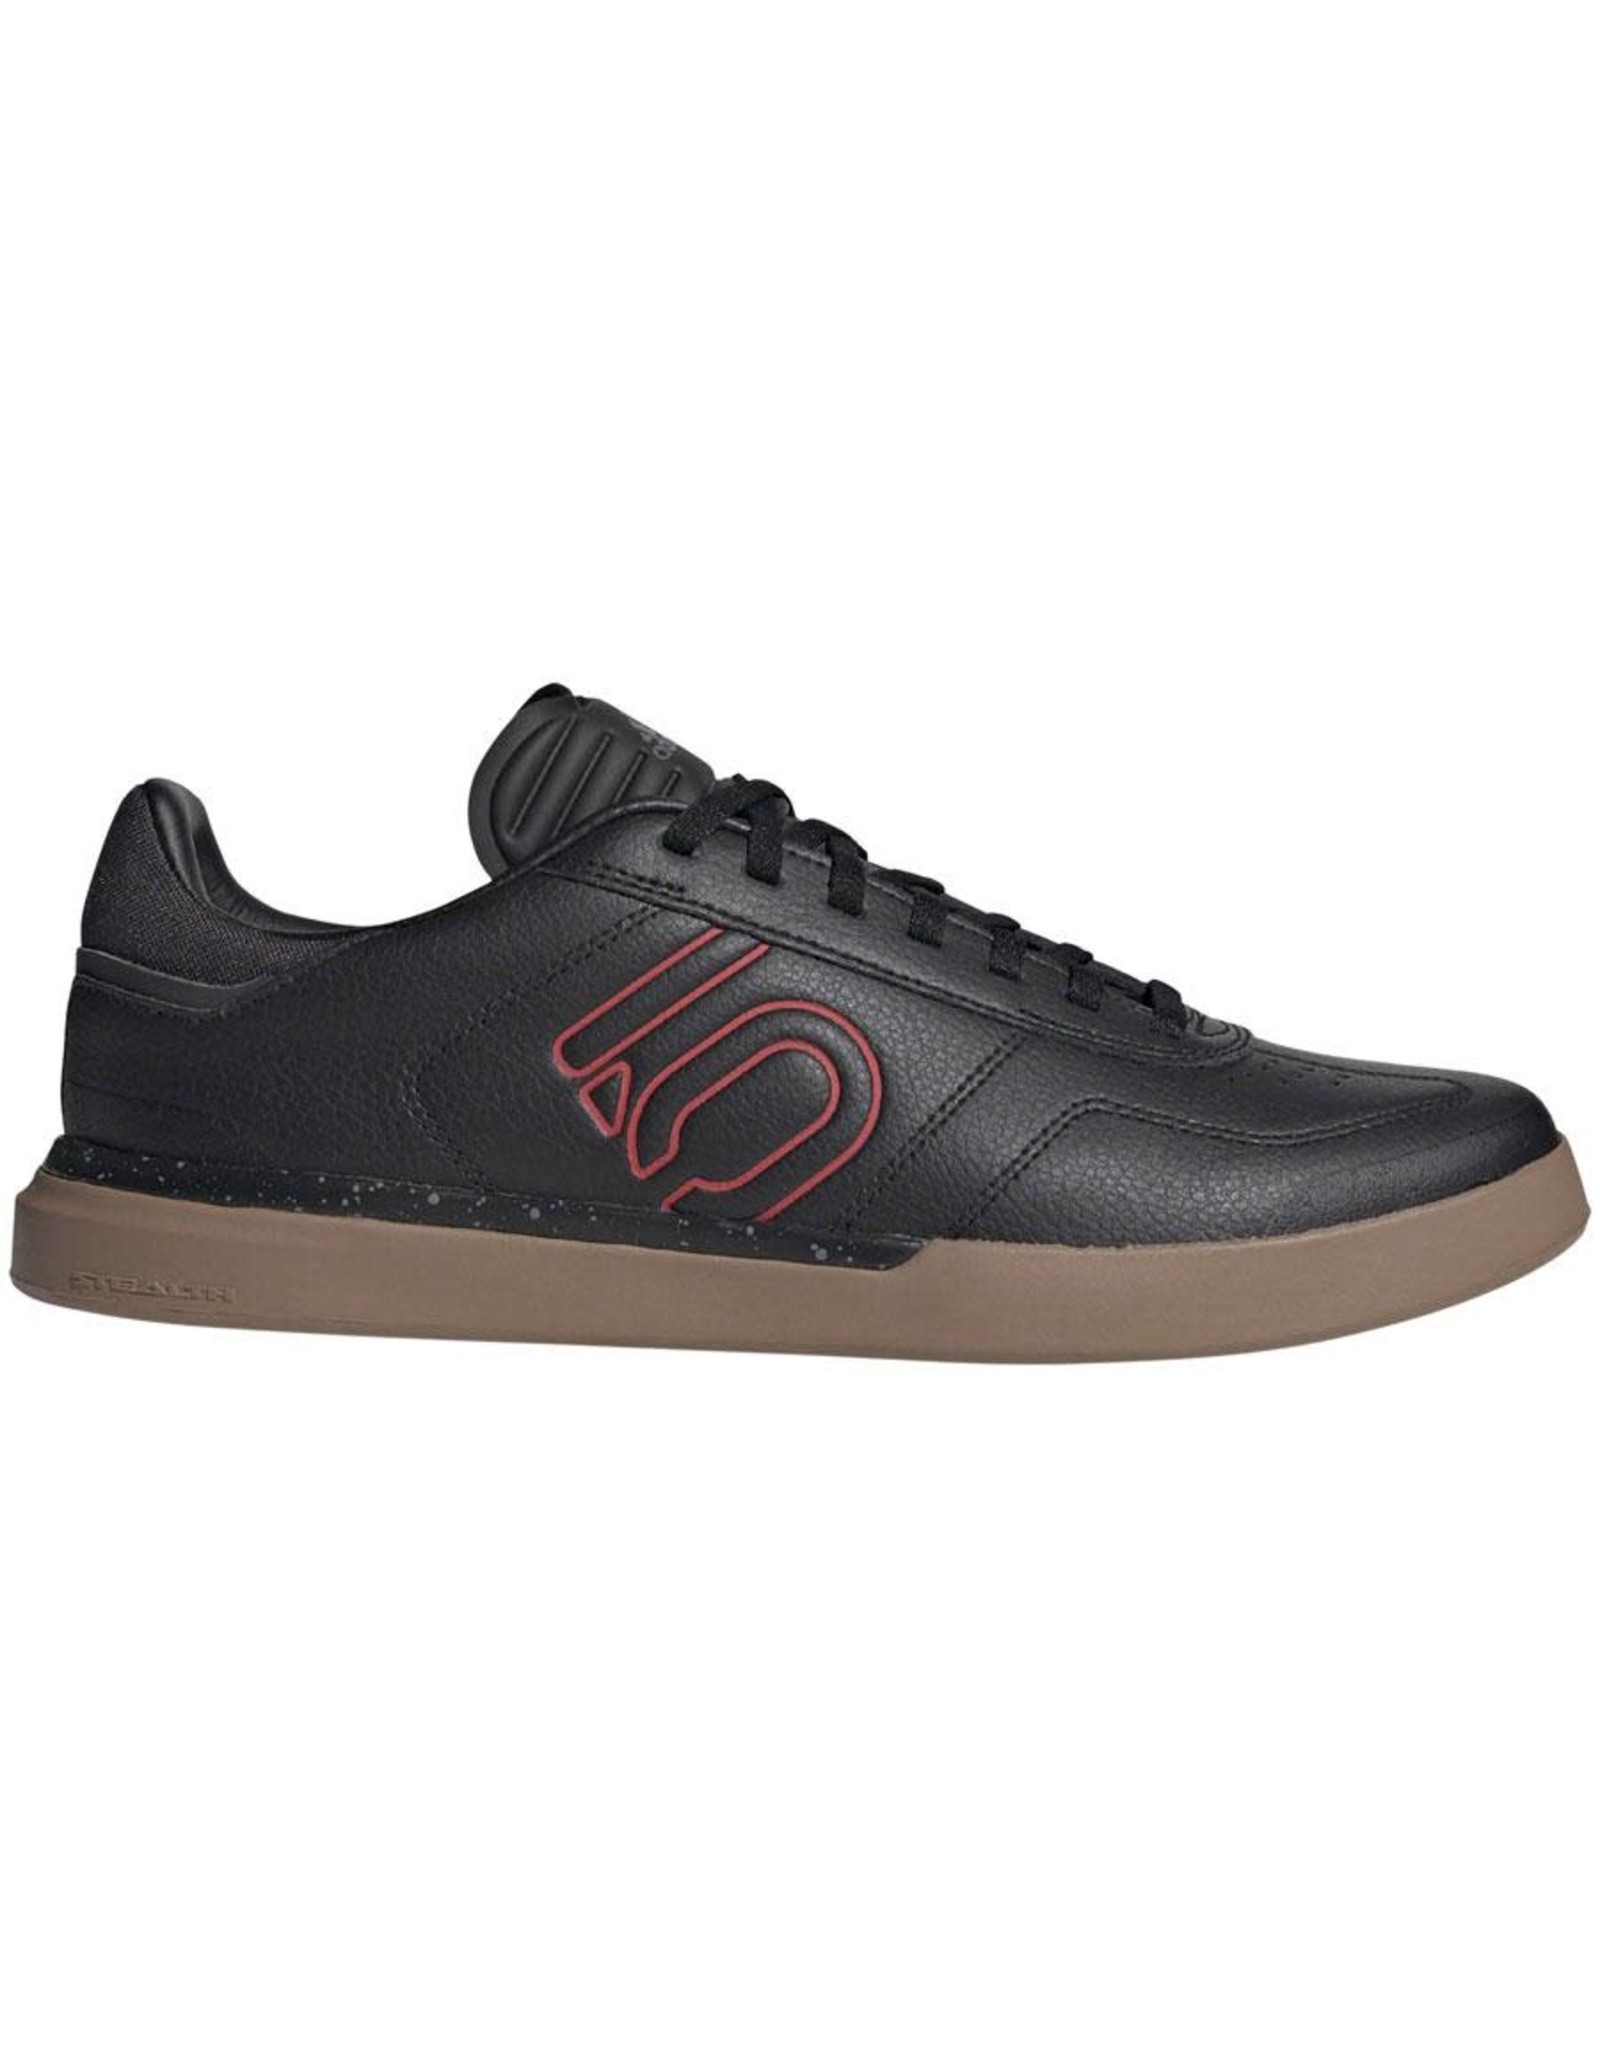 Five Ten Five Ten Sleuth DLX PU Men's Flat Shoe: Black/Scarlet/Gum